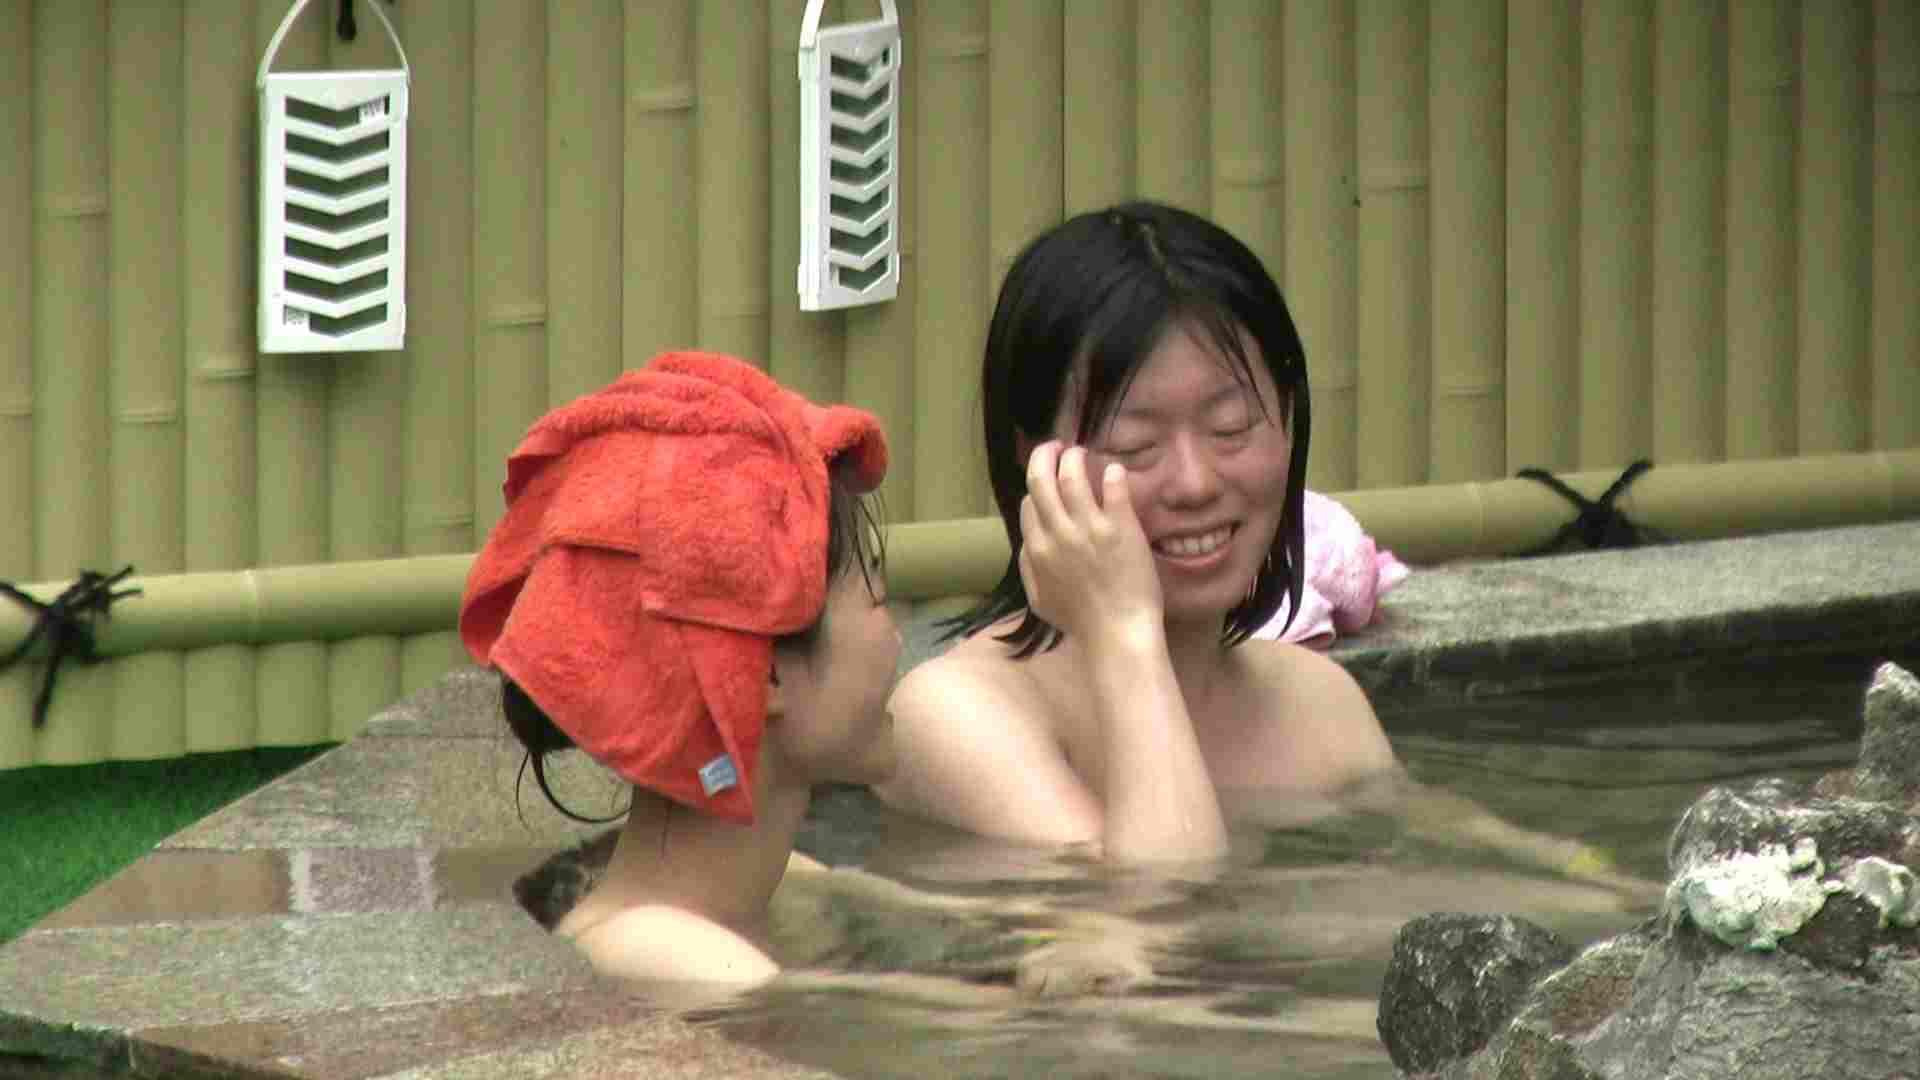 Aquaな露天風呂Vol.187 盗撮  63連発 10